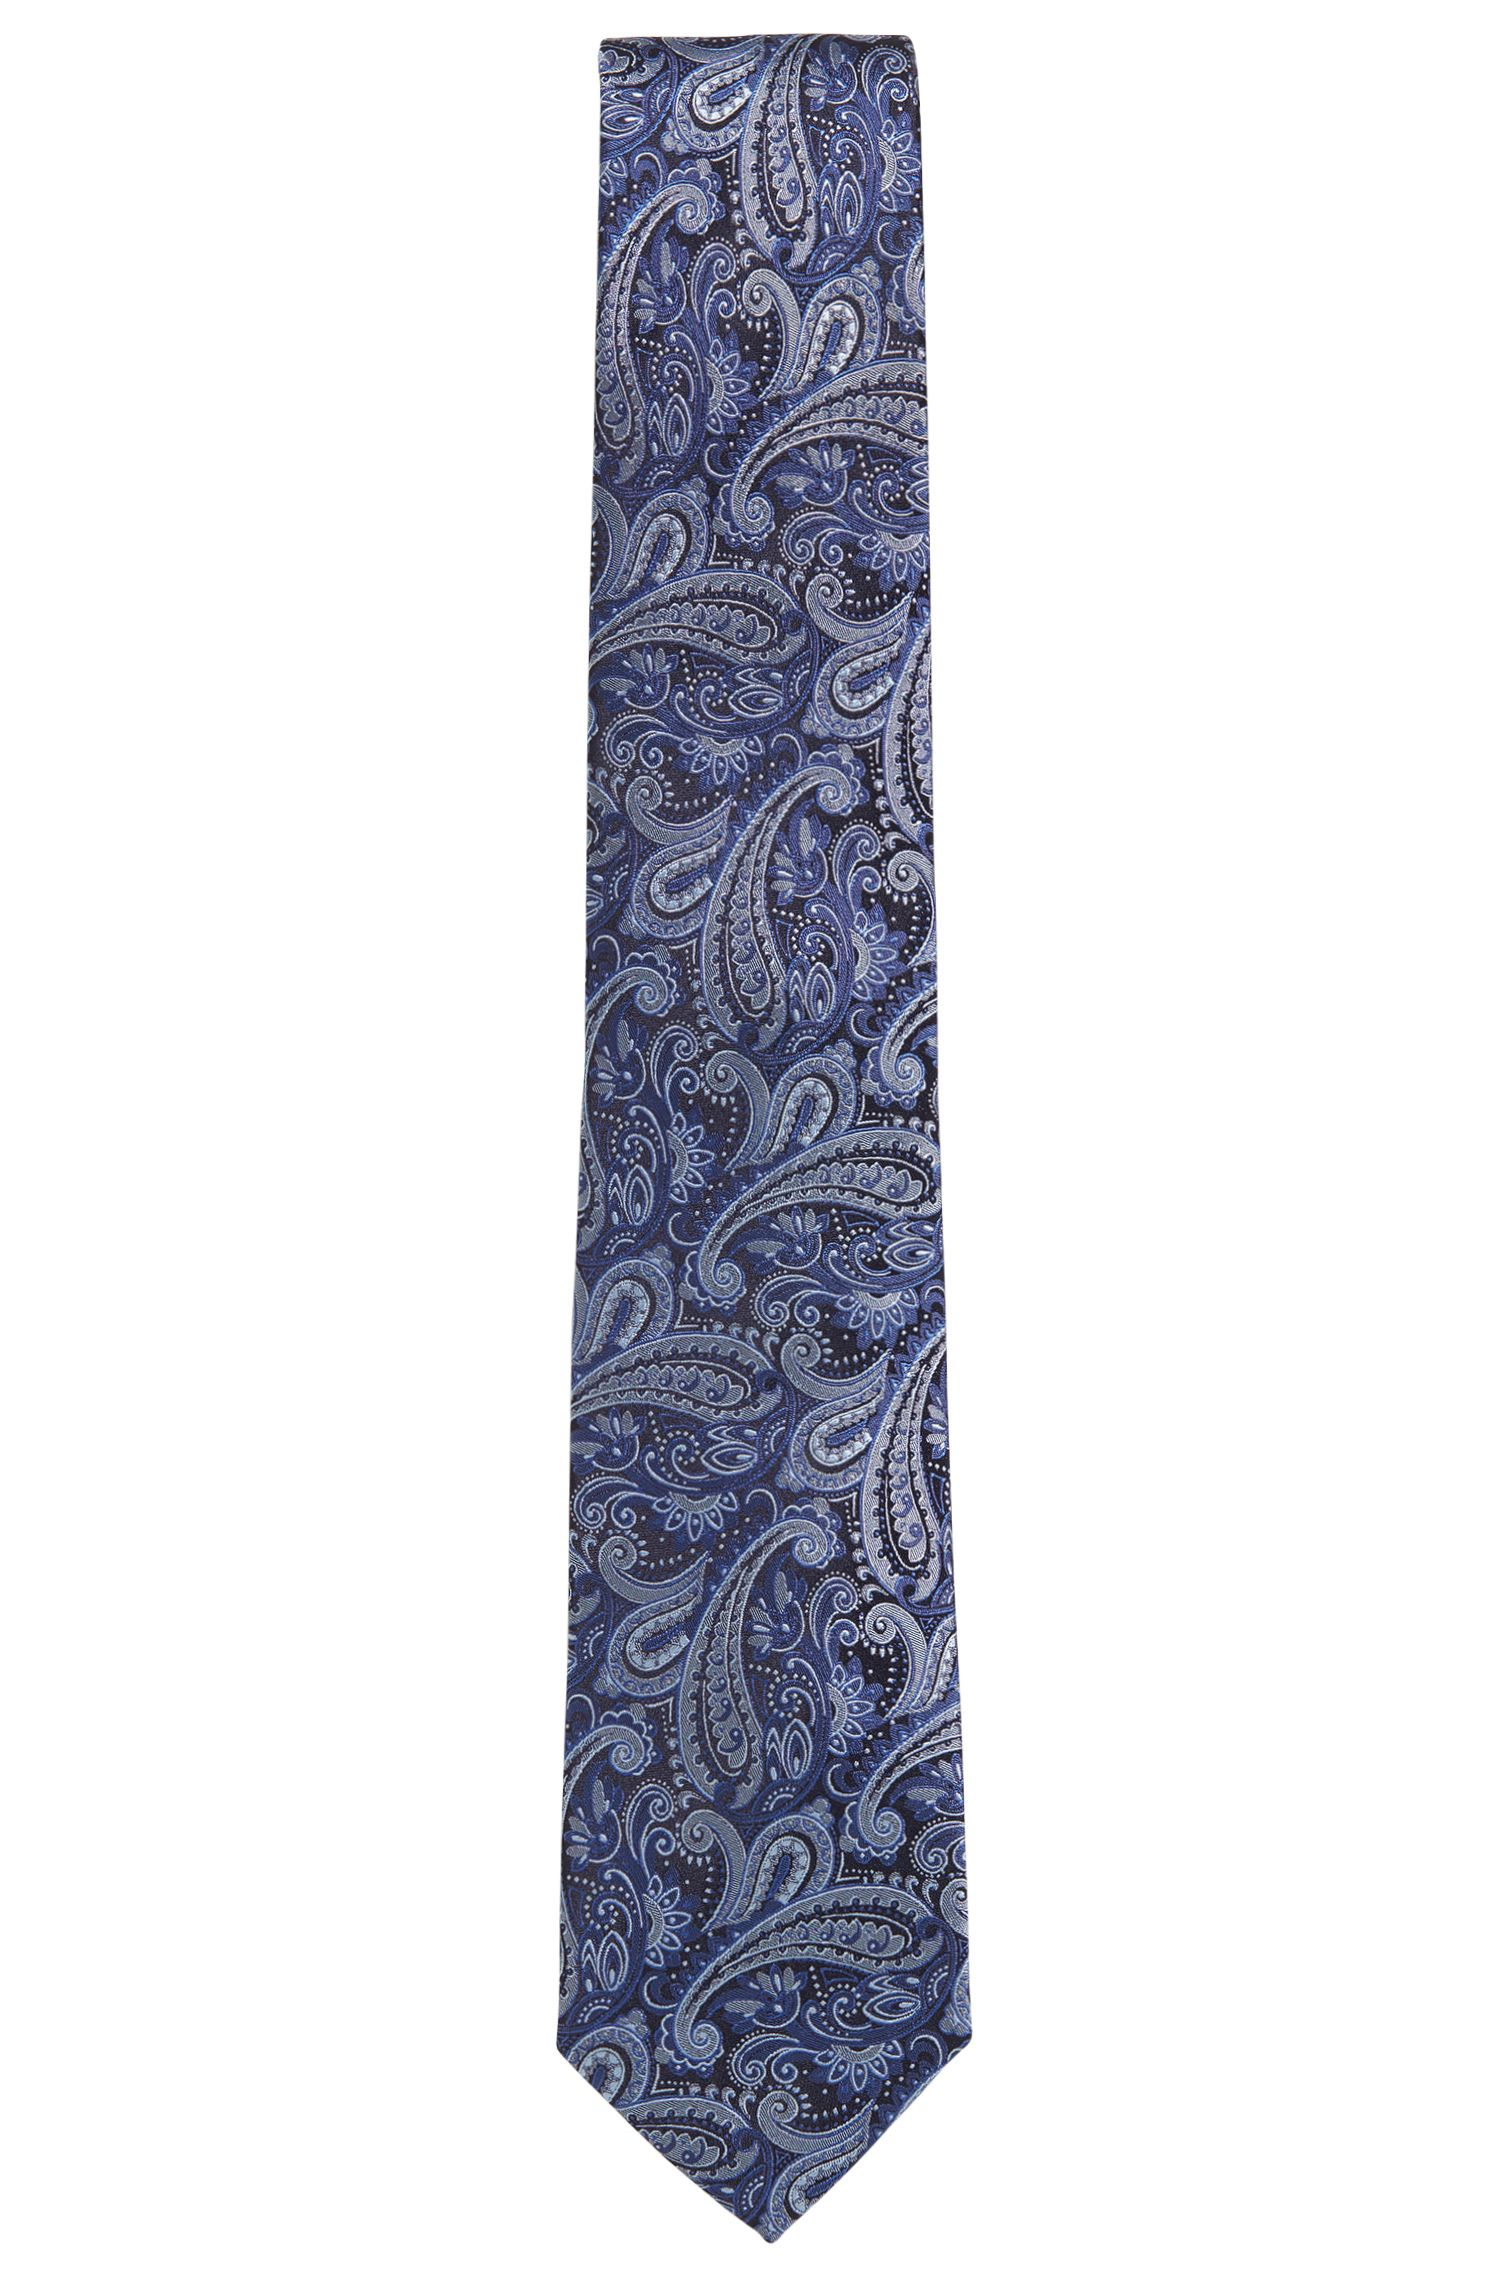 Krawatte aus Seiden-Jacquard mit Paisley-Muster